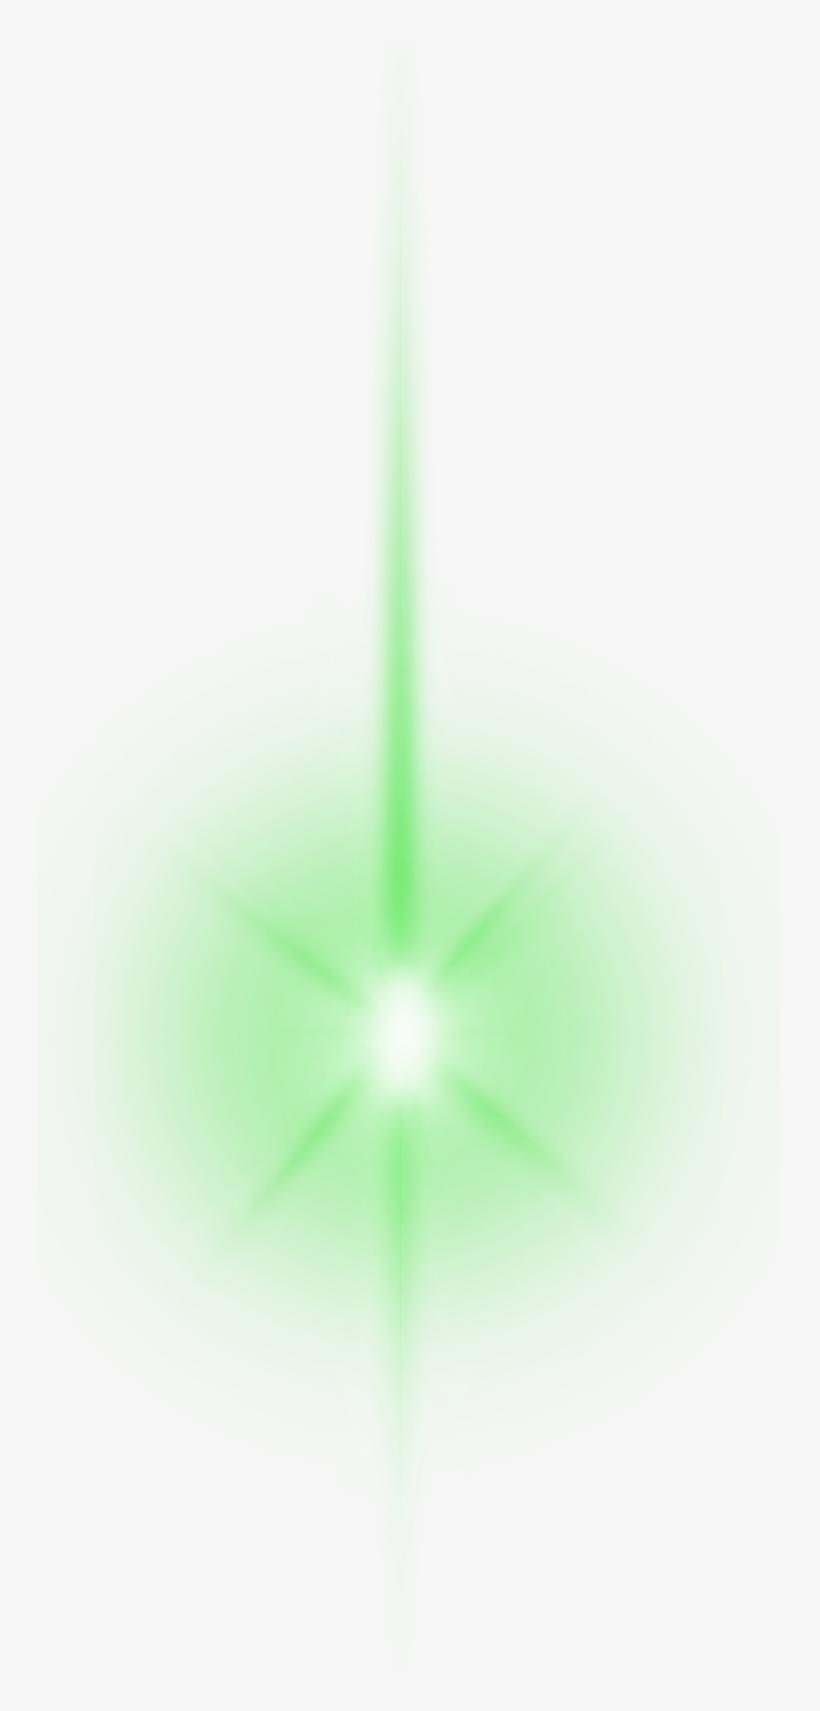 Laser Eyes Meme Png Cross Png Image Transparent Png Free